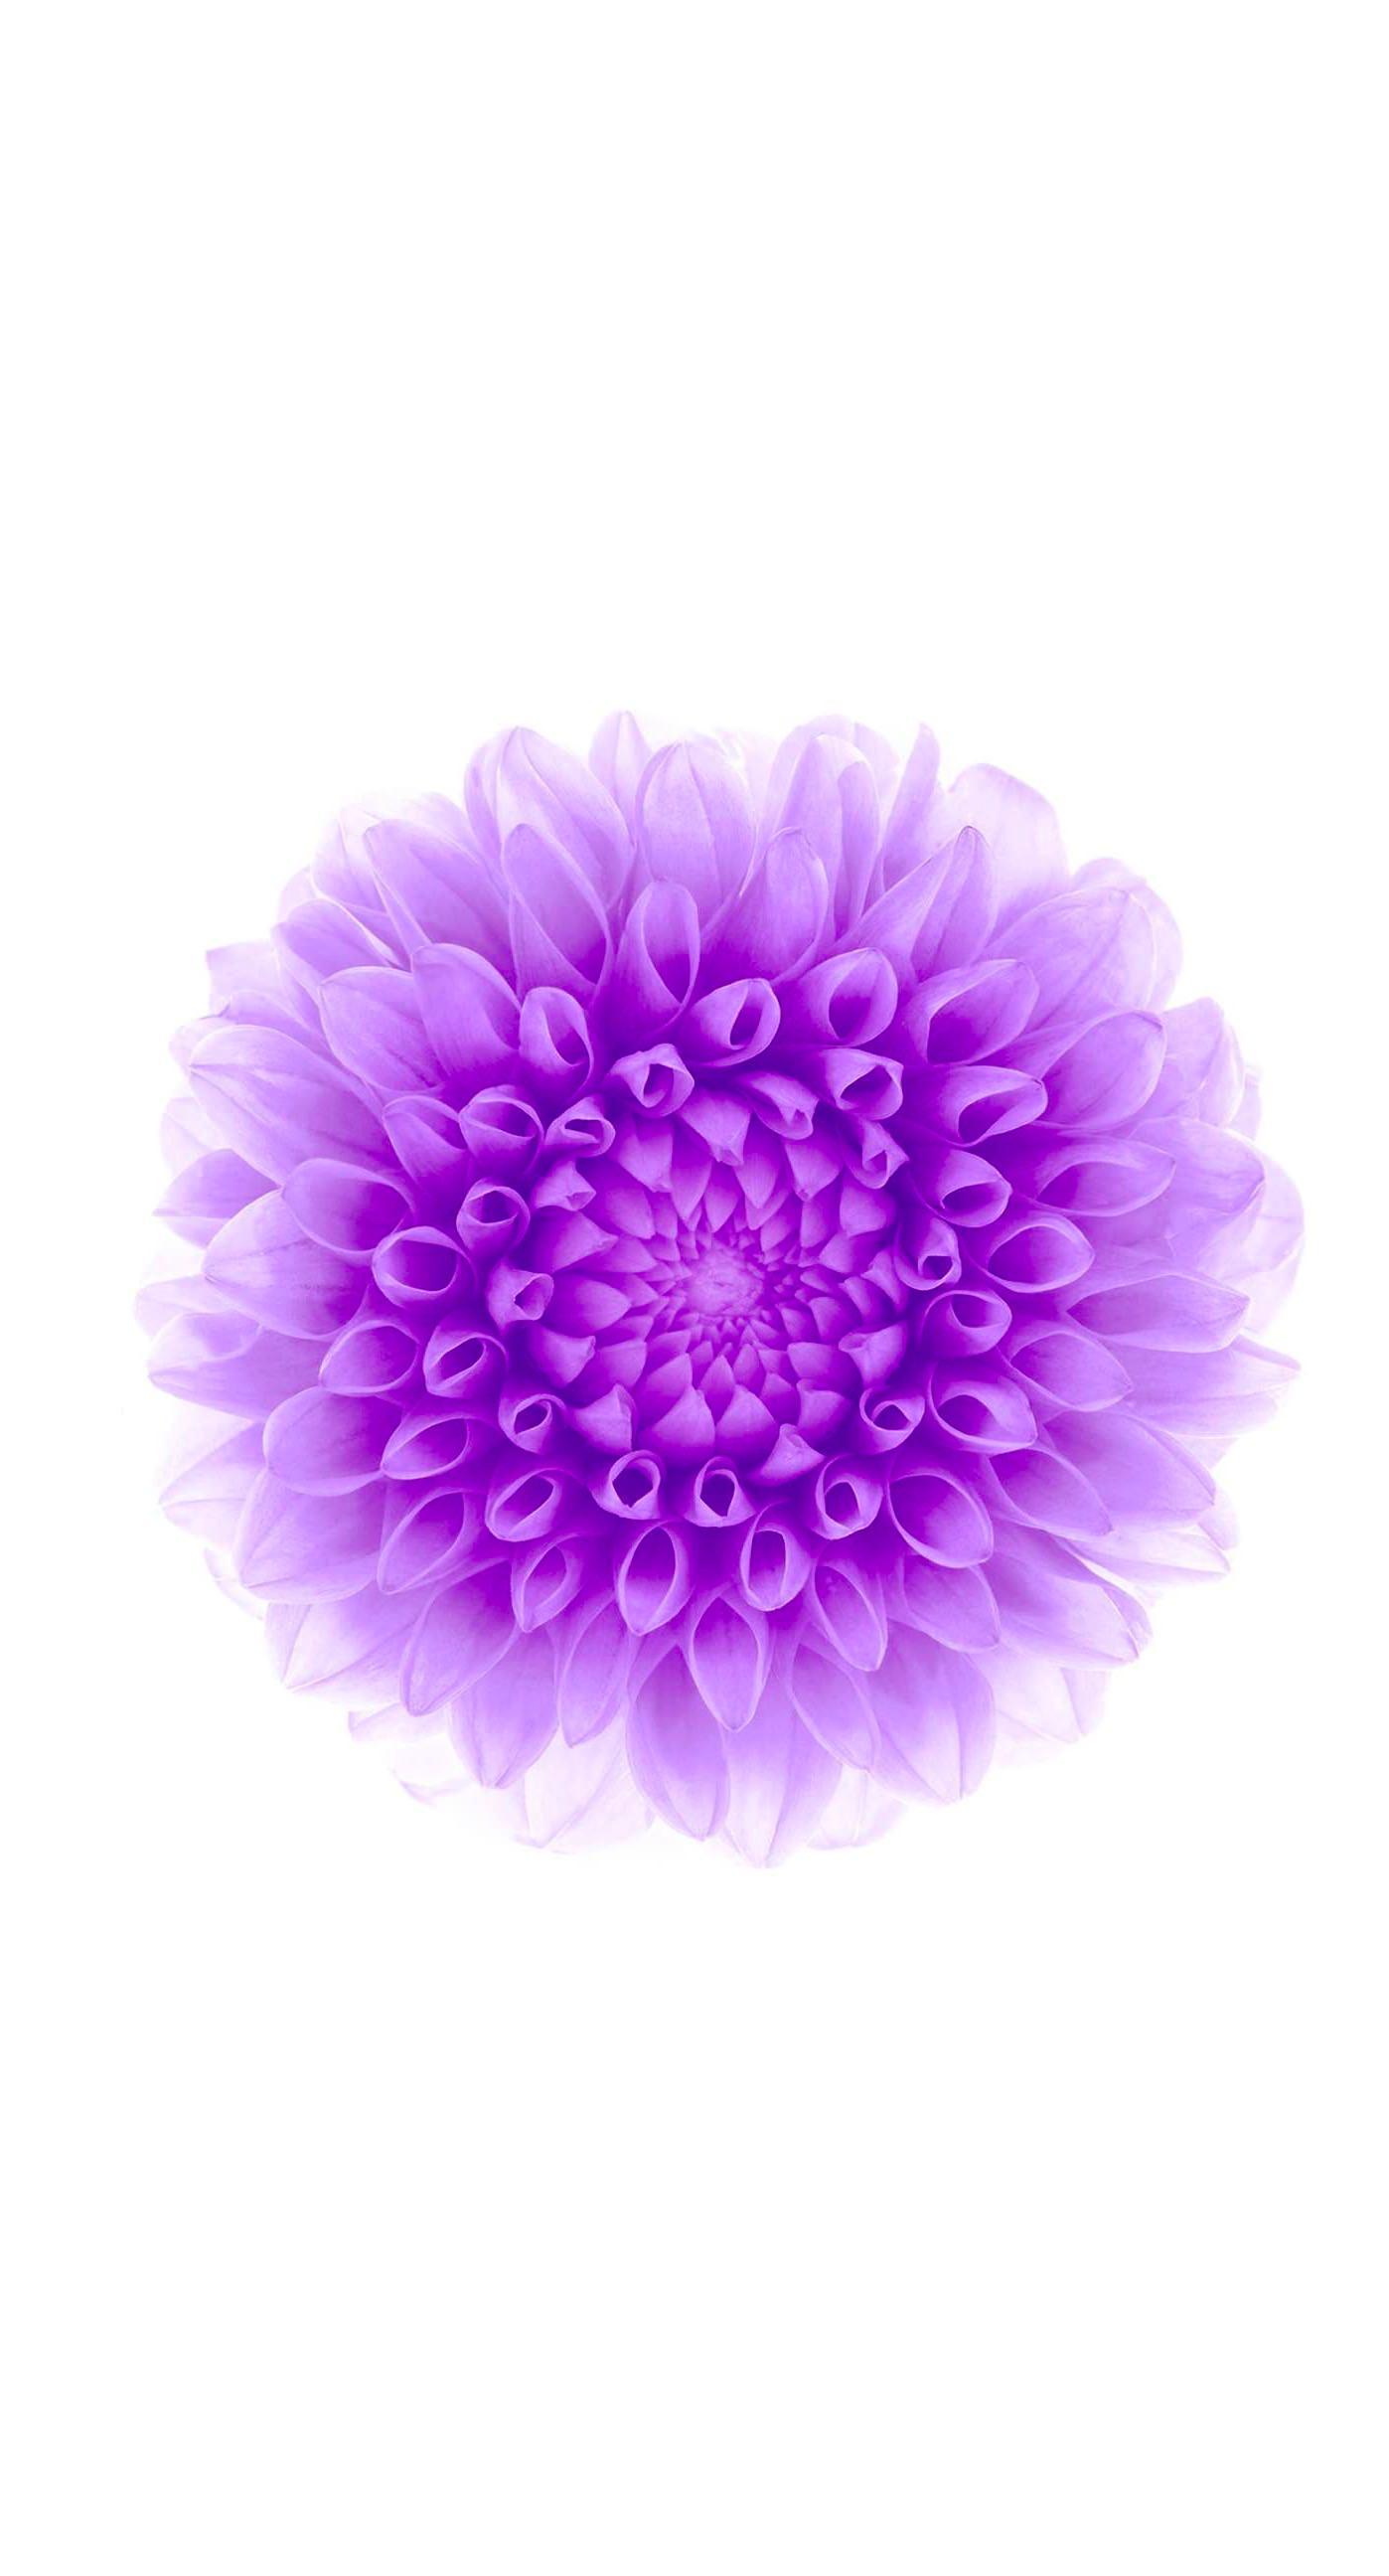 Flower purple white iphone6splus for Purple and white wallpaper